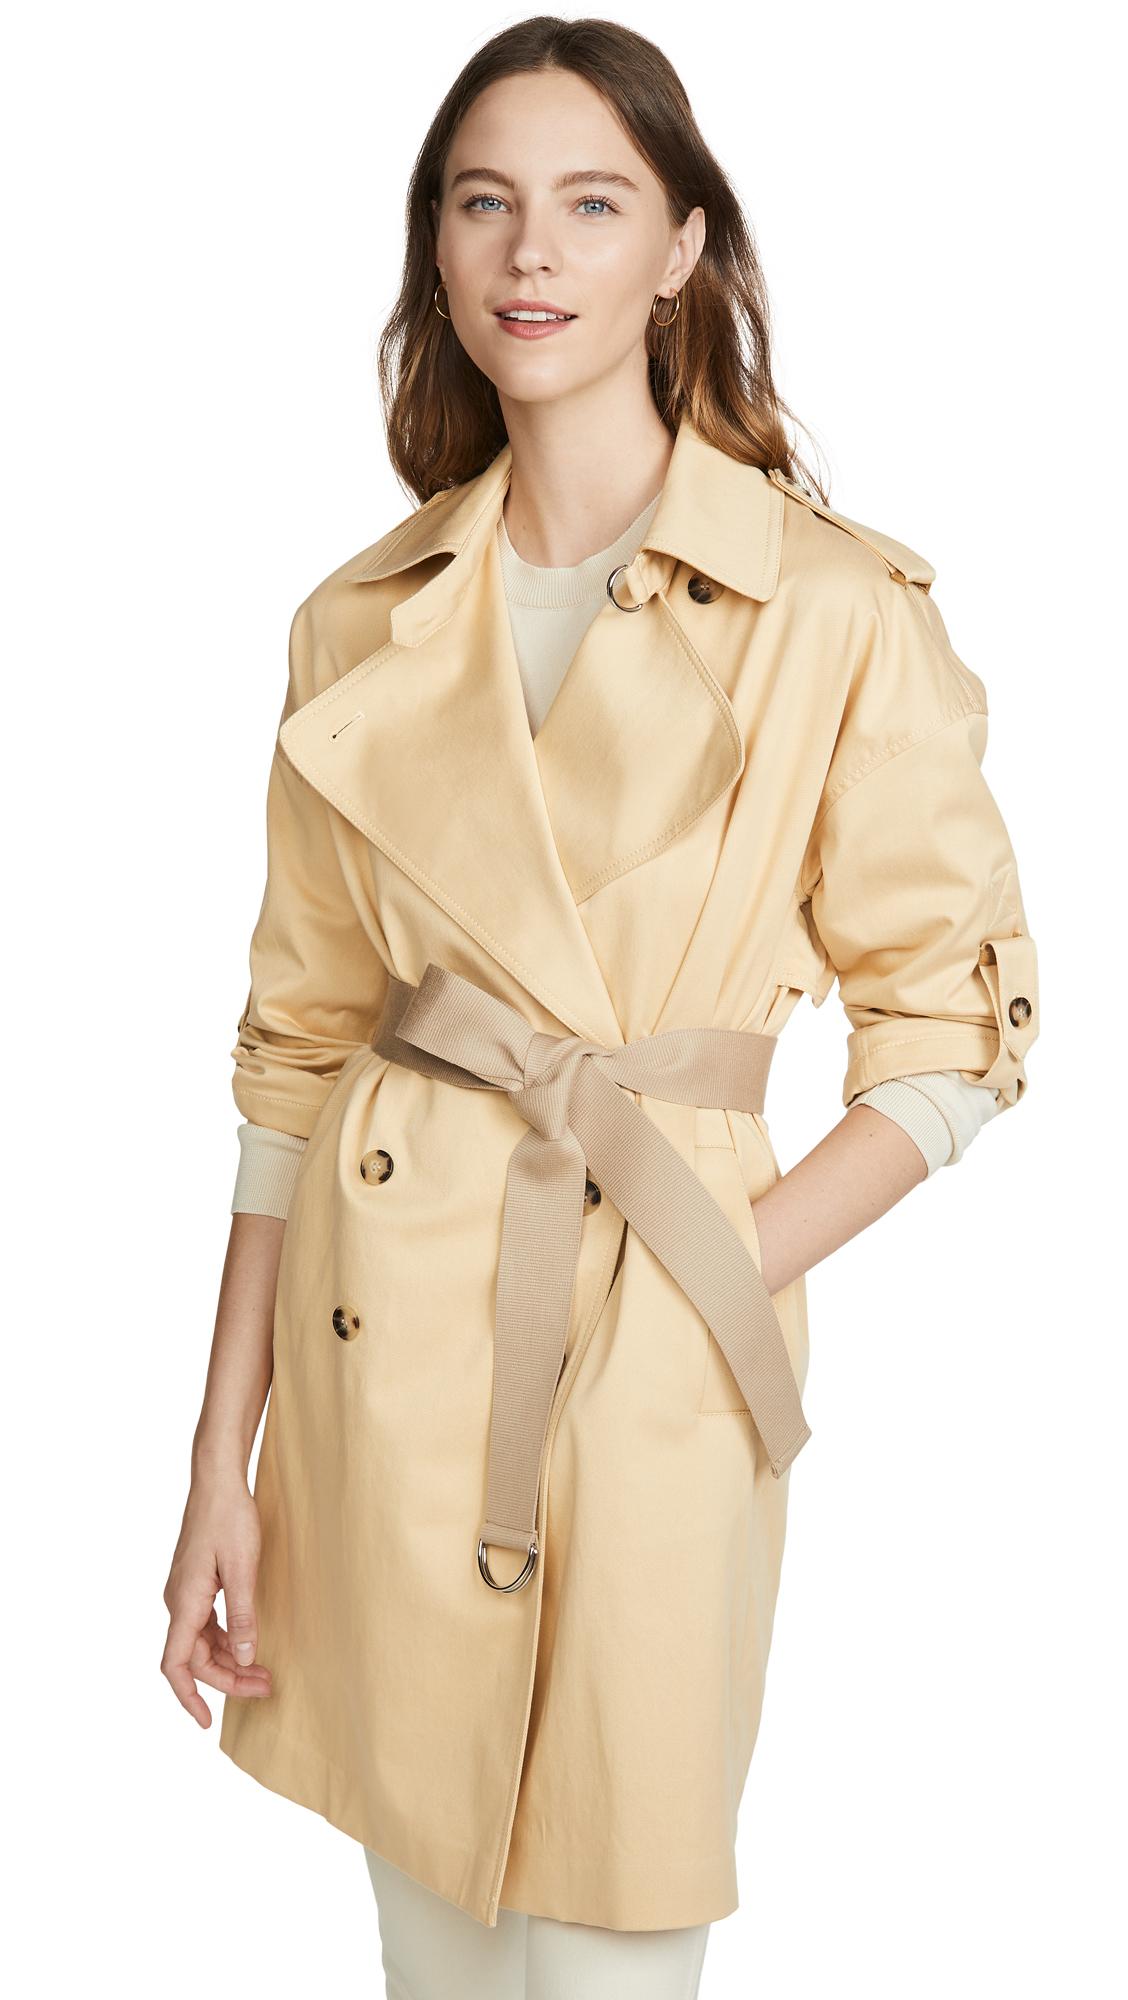 Buy Club Monaco ADJ Sleeve Trench Jacket online beautiful Club Monaco Jackets, Coats, Trench Coats